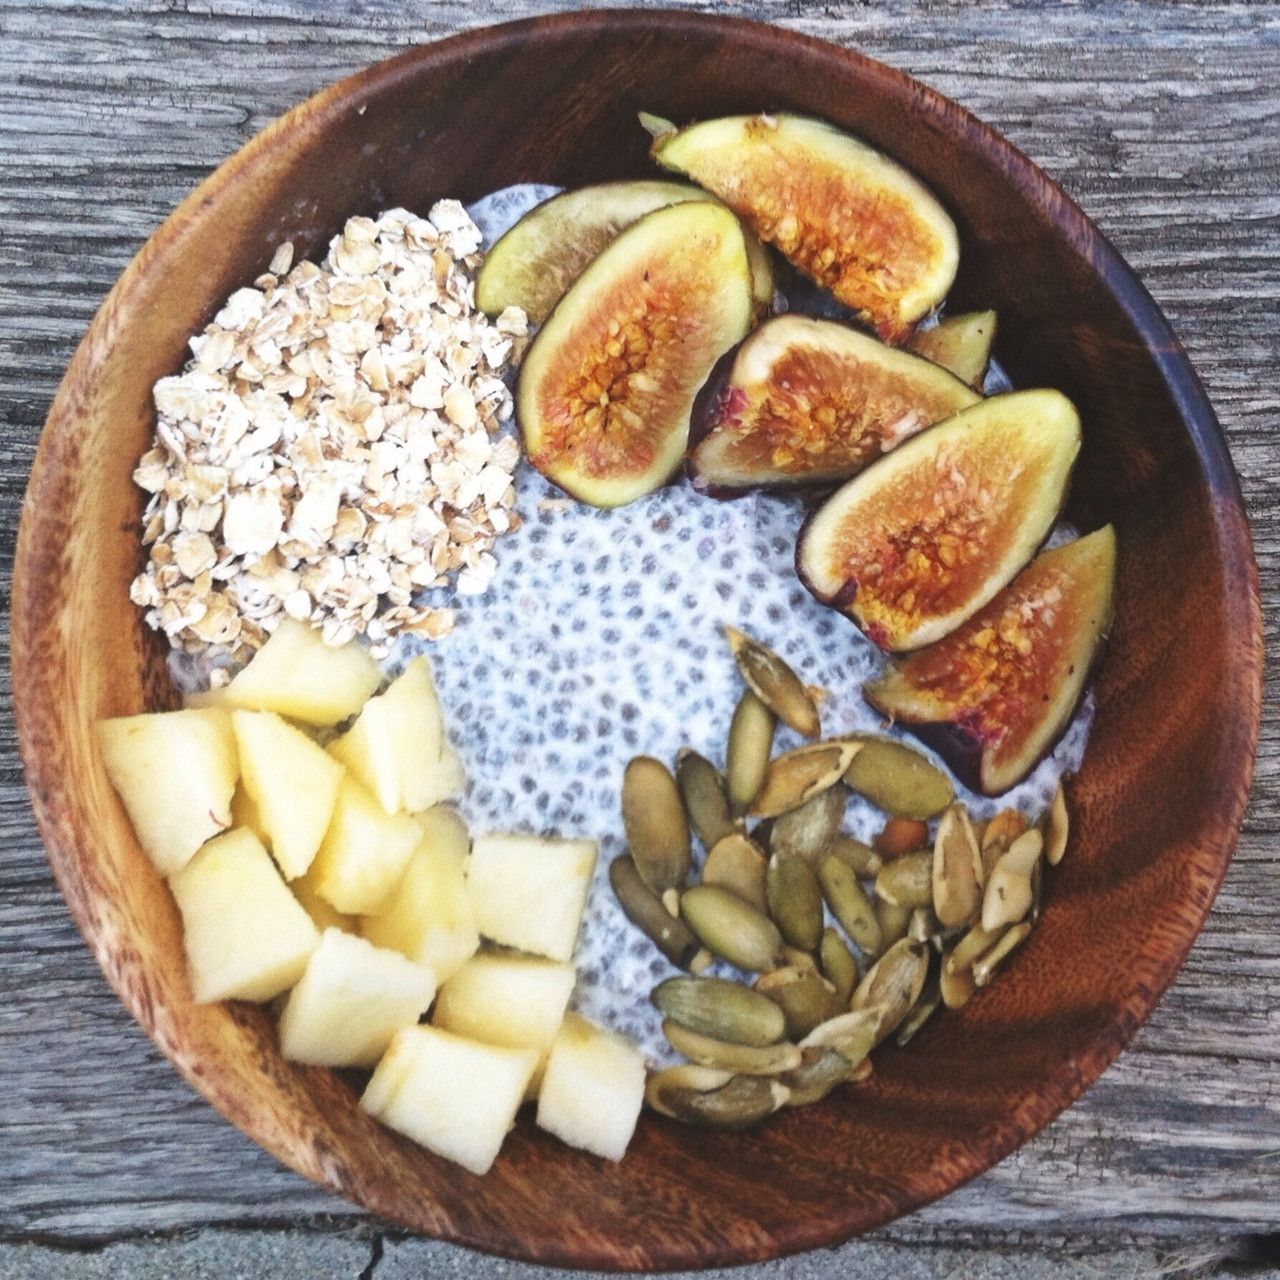 Chia Seed Breakfast Recipe  Chia Seed Breakfast Bowl Recipe — Dishmaps